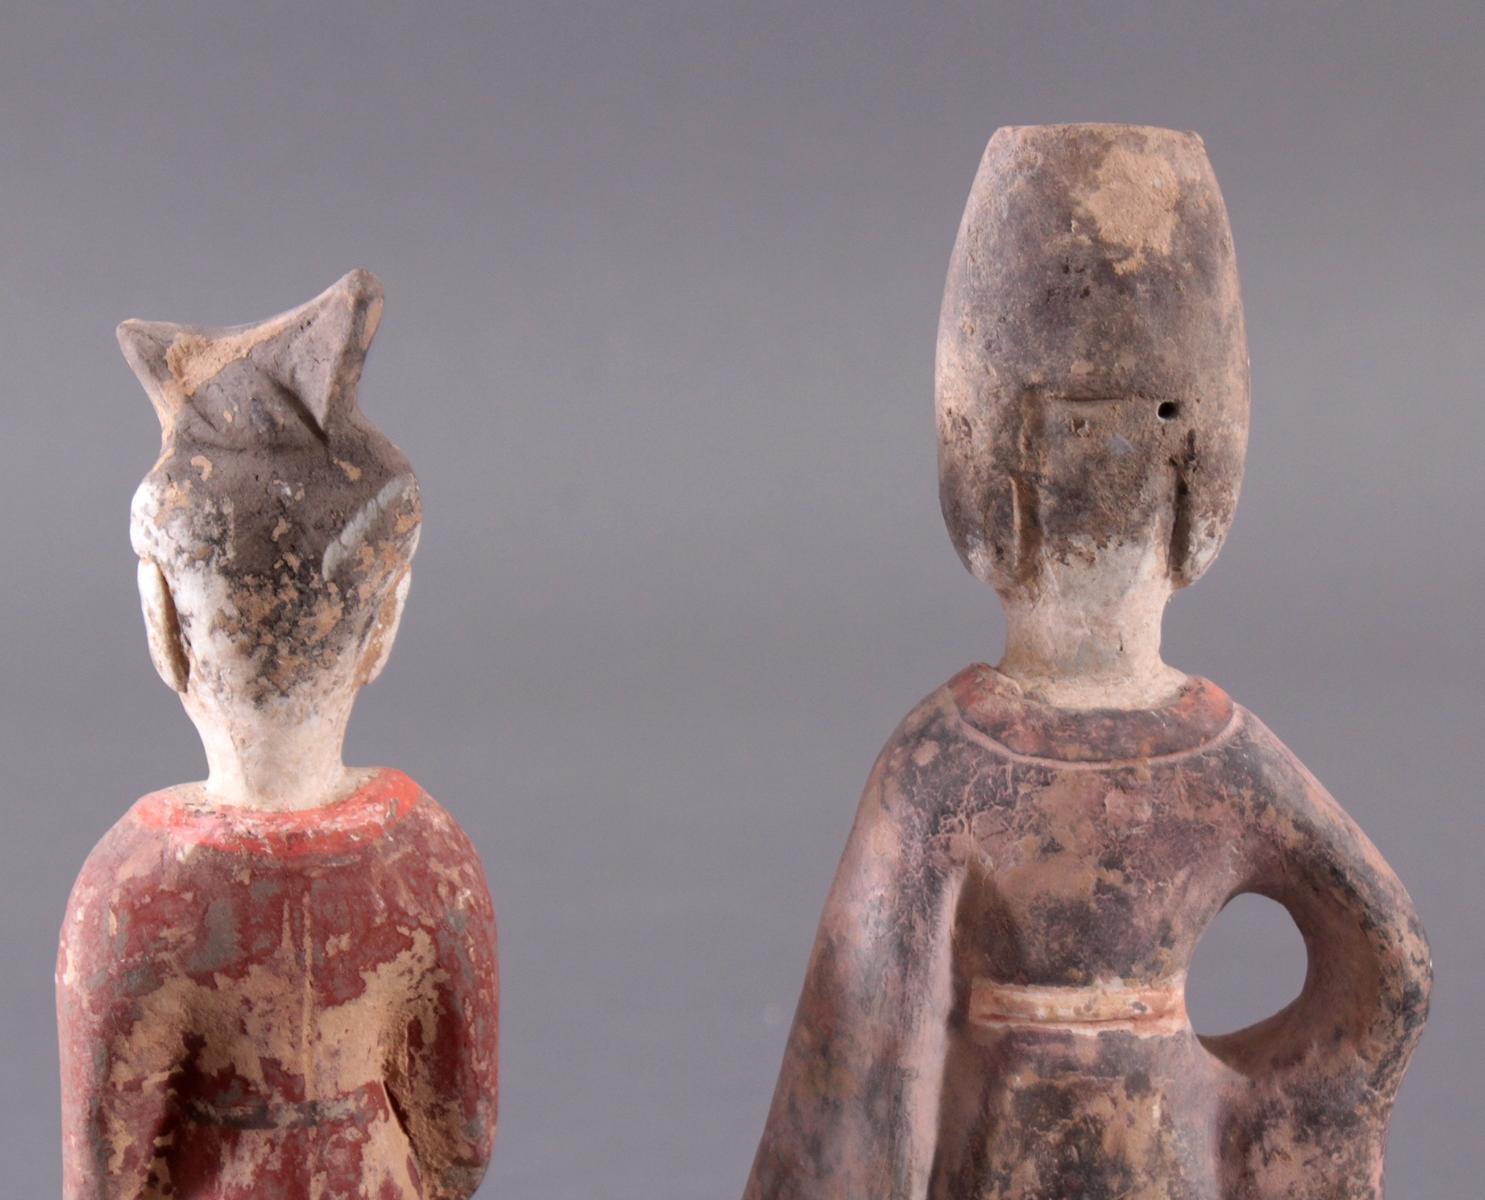 China TANG-Dynastie, 2 Figuren aus Ton-6